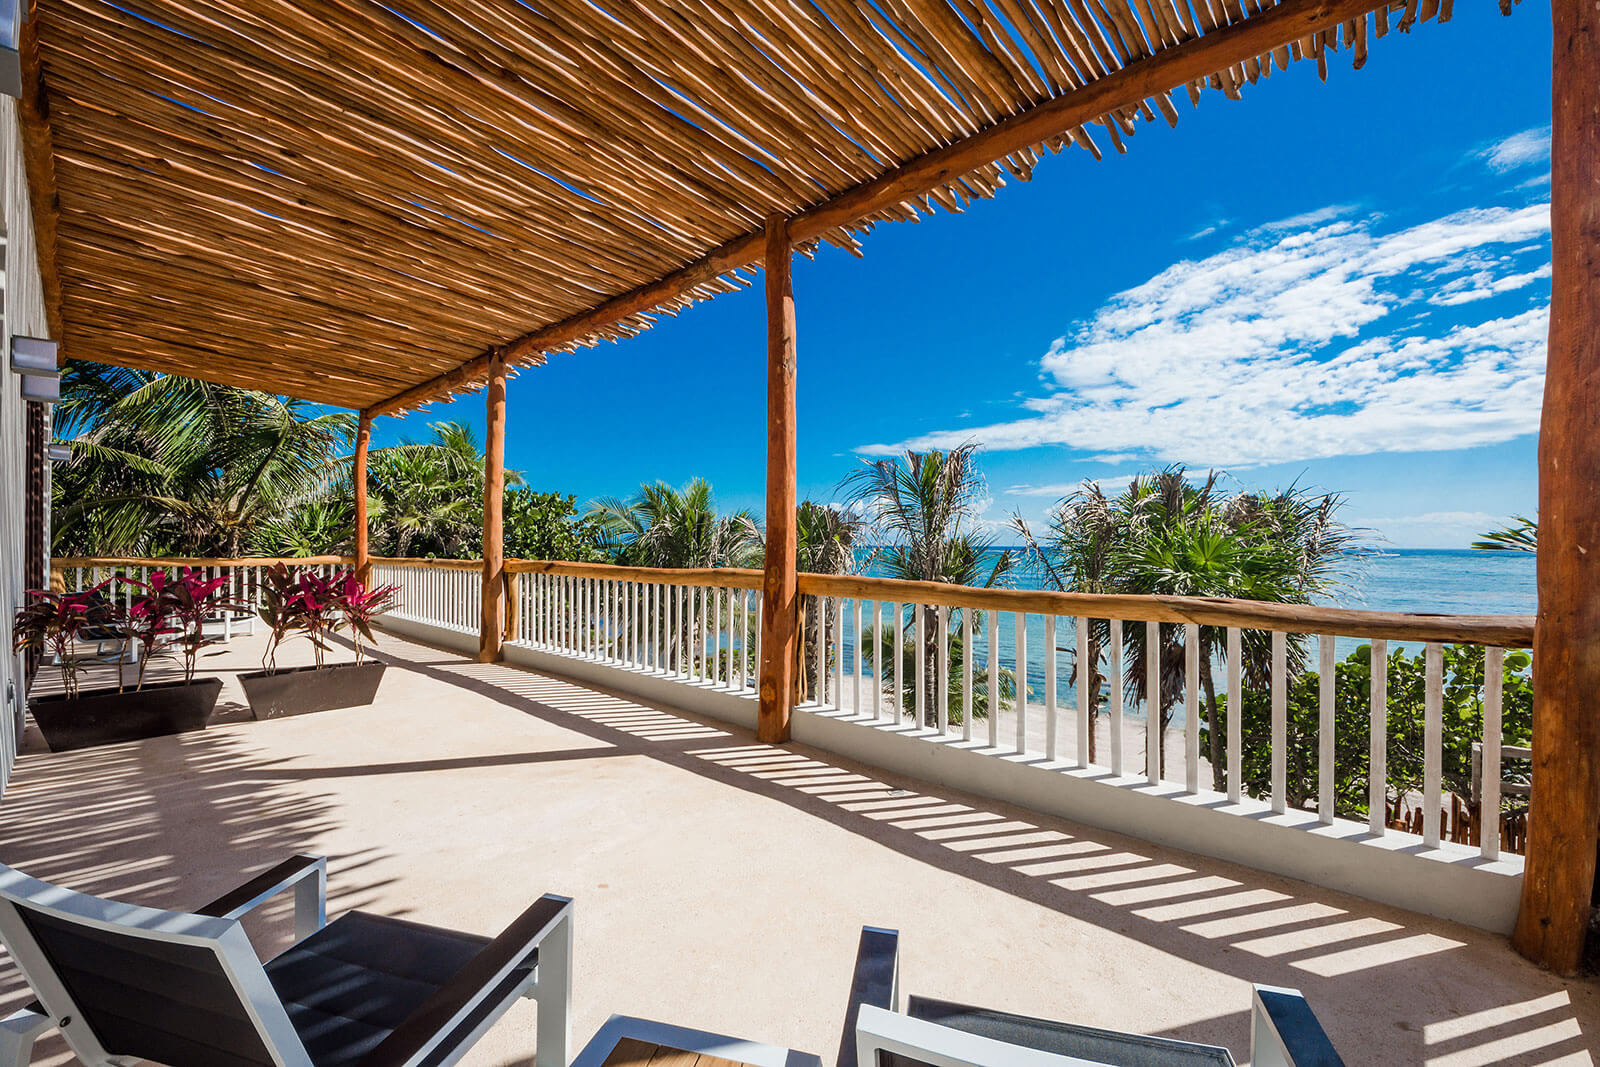 Maya_Luxe_Riviera_Maya_Luxury_Villas_Experiences_Tulum_Soliman_Bay_5_Bedrooms_24.jpg